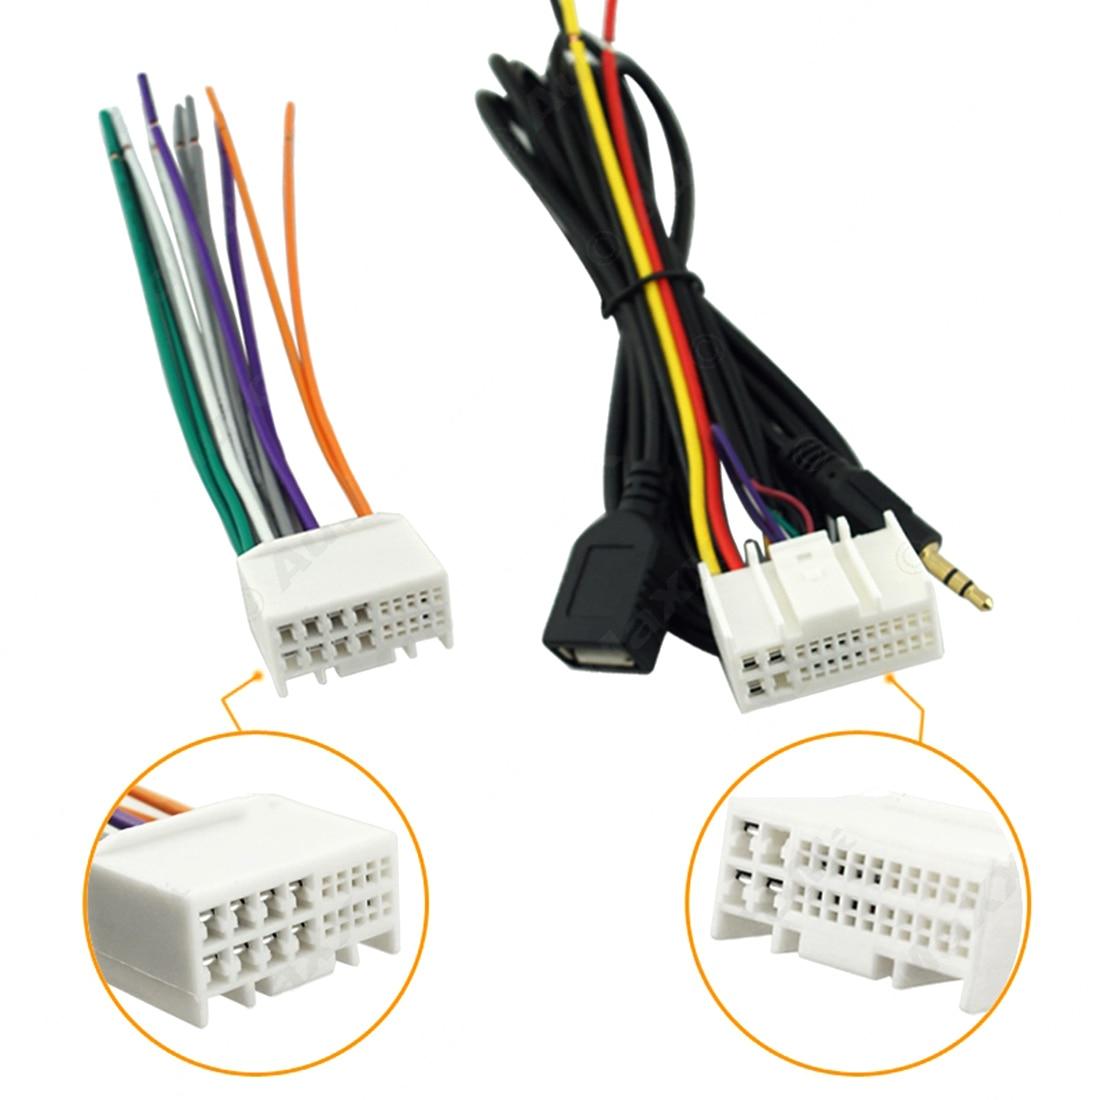 dewtreetali car audio cd stereo wiring harness adapter with usb aux rh aliexpress com kia sedona trailer wiring harness kia sportage trailer wiring harness